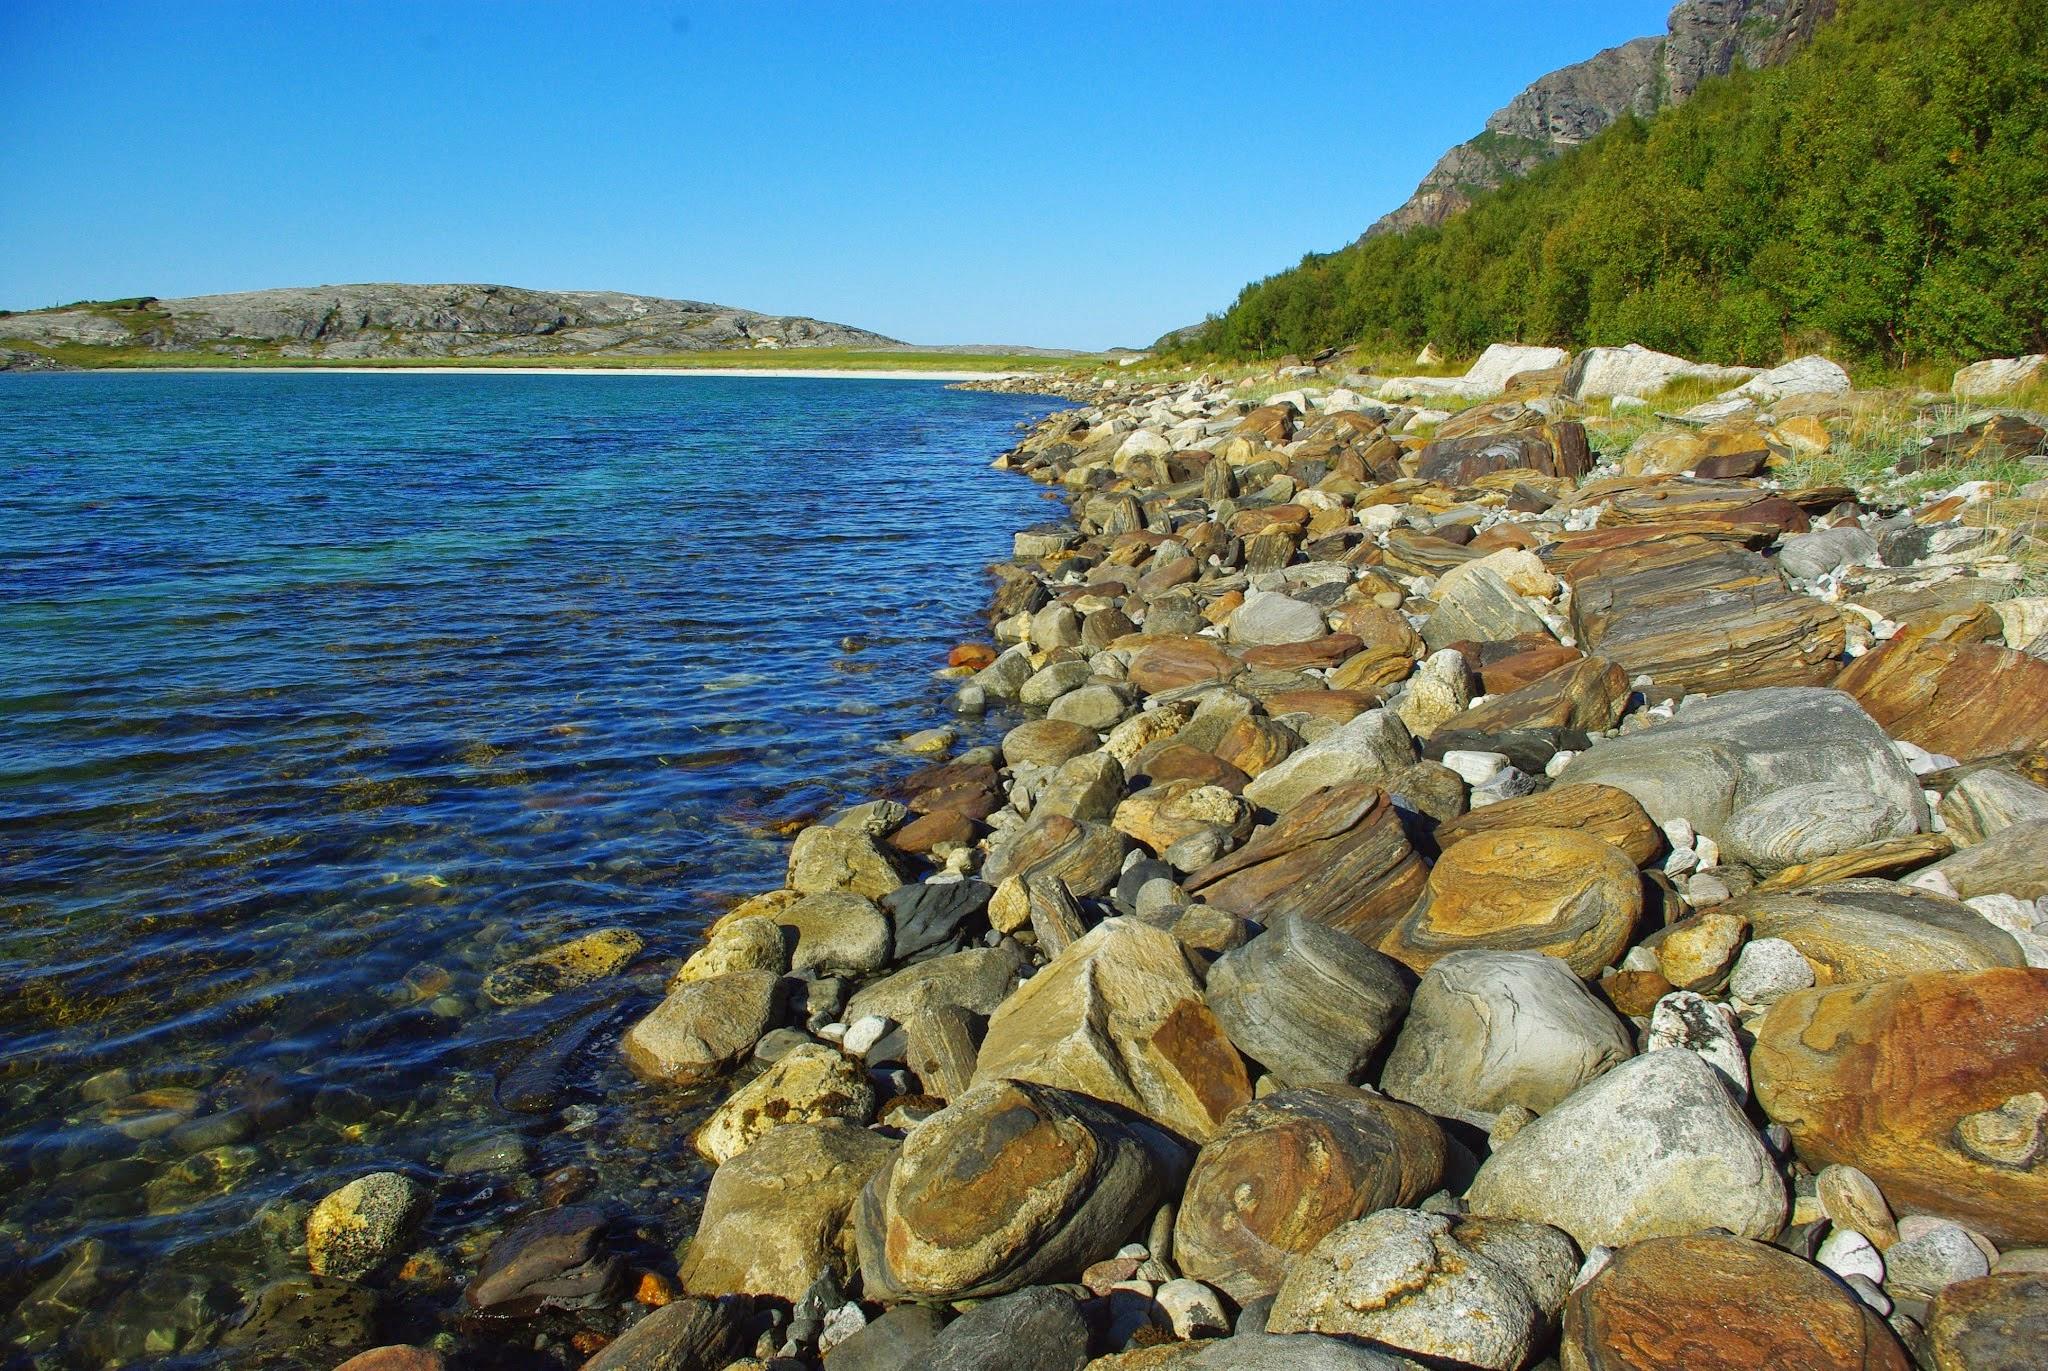 The weird and wonderful rocks of Mjelle beach.